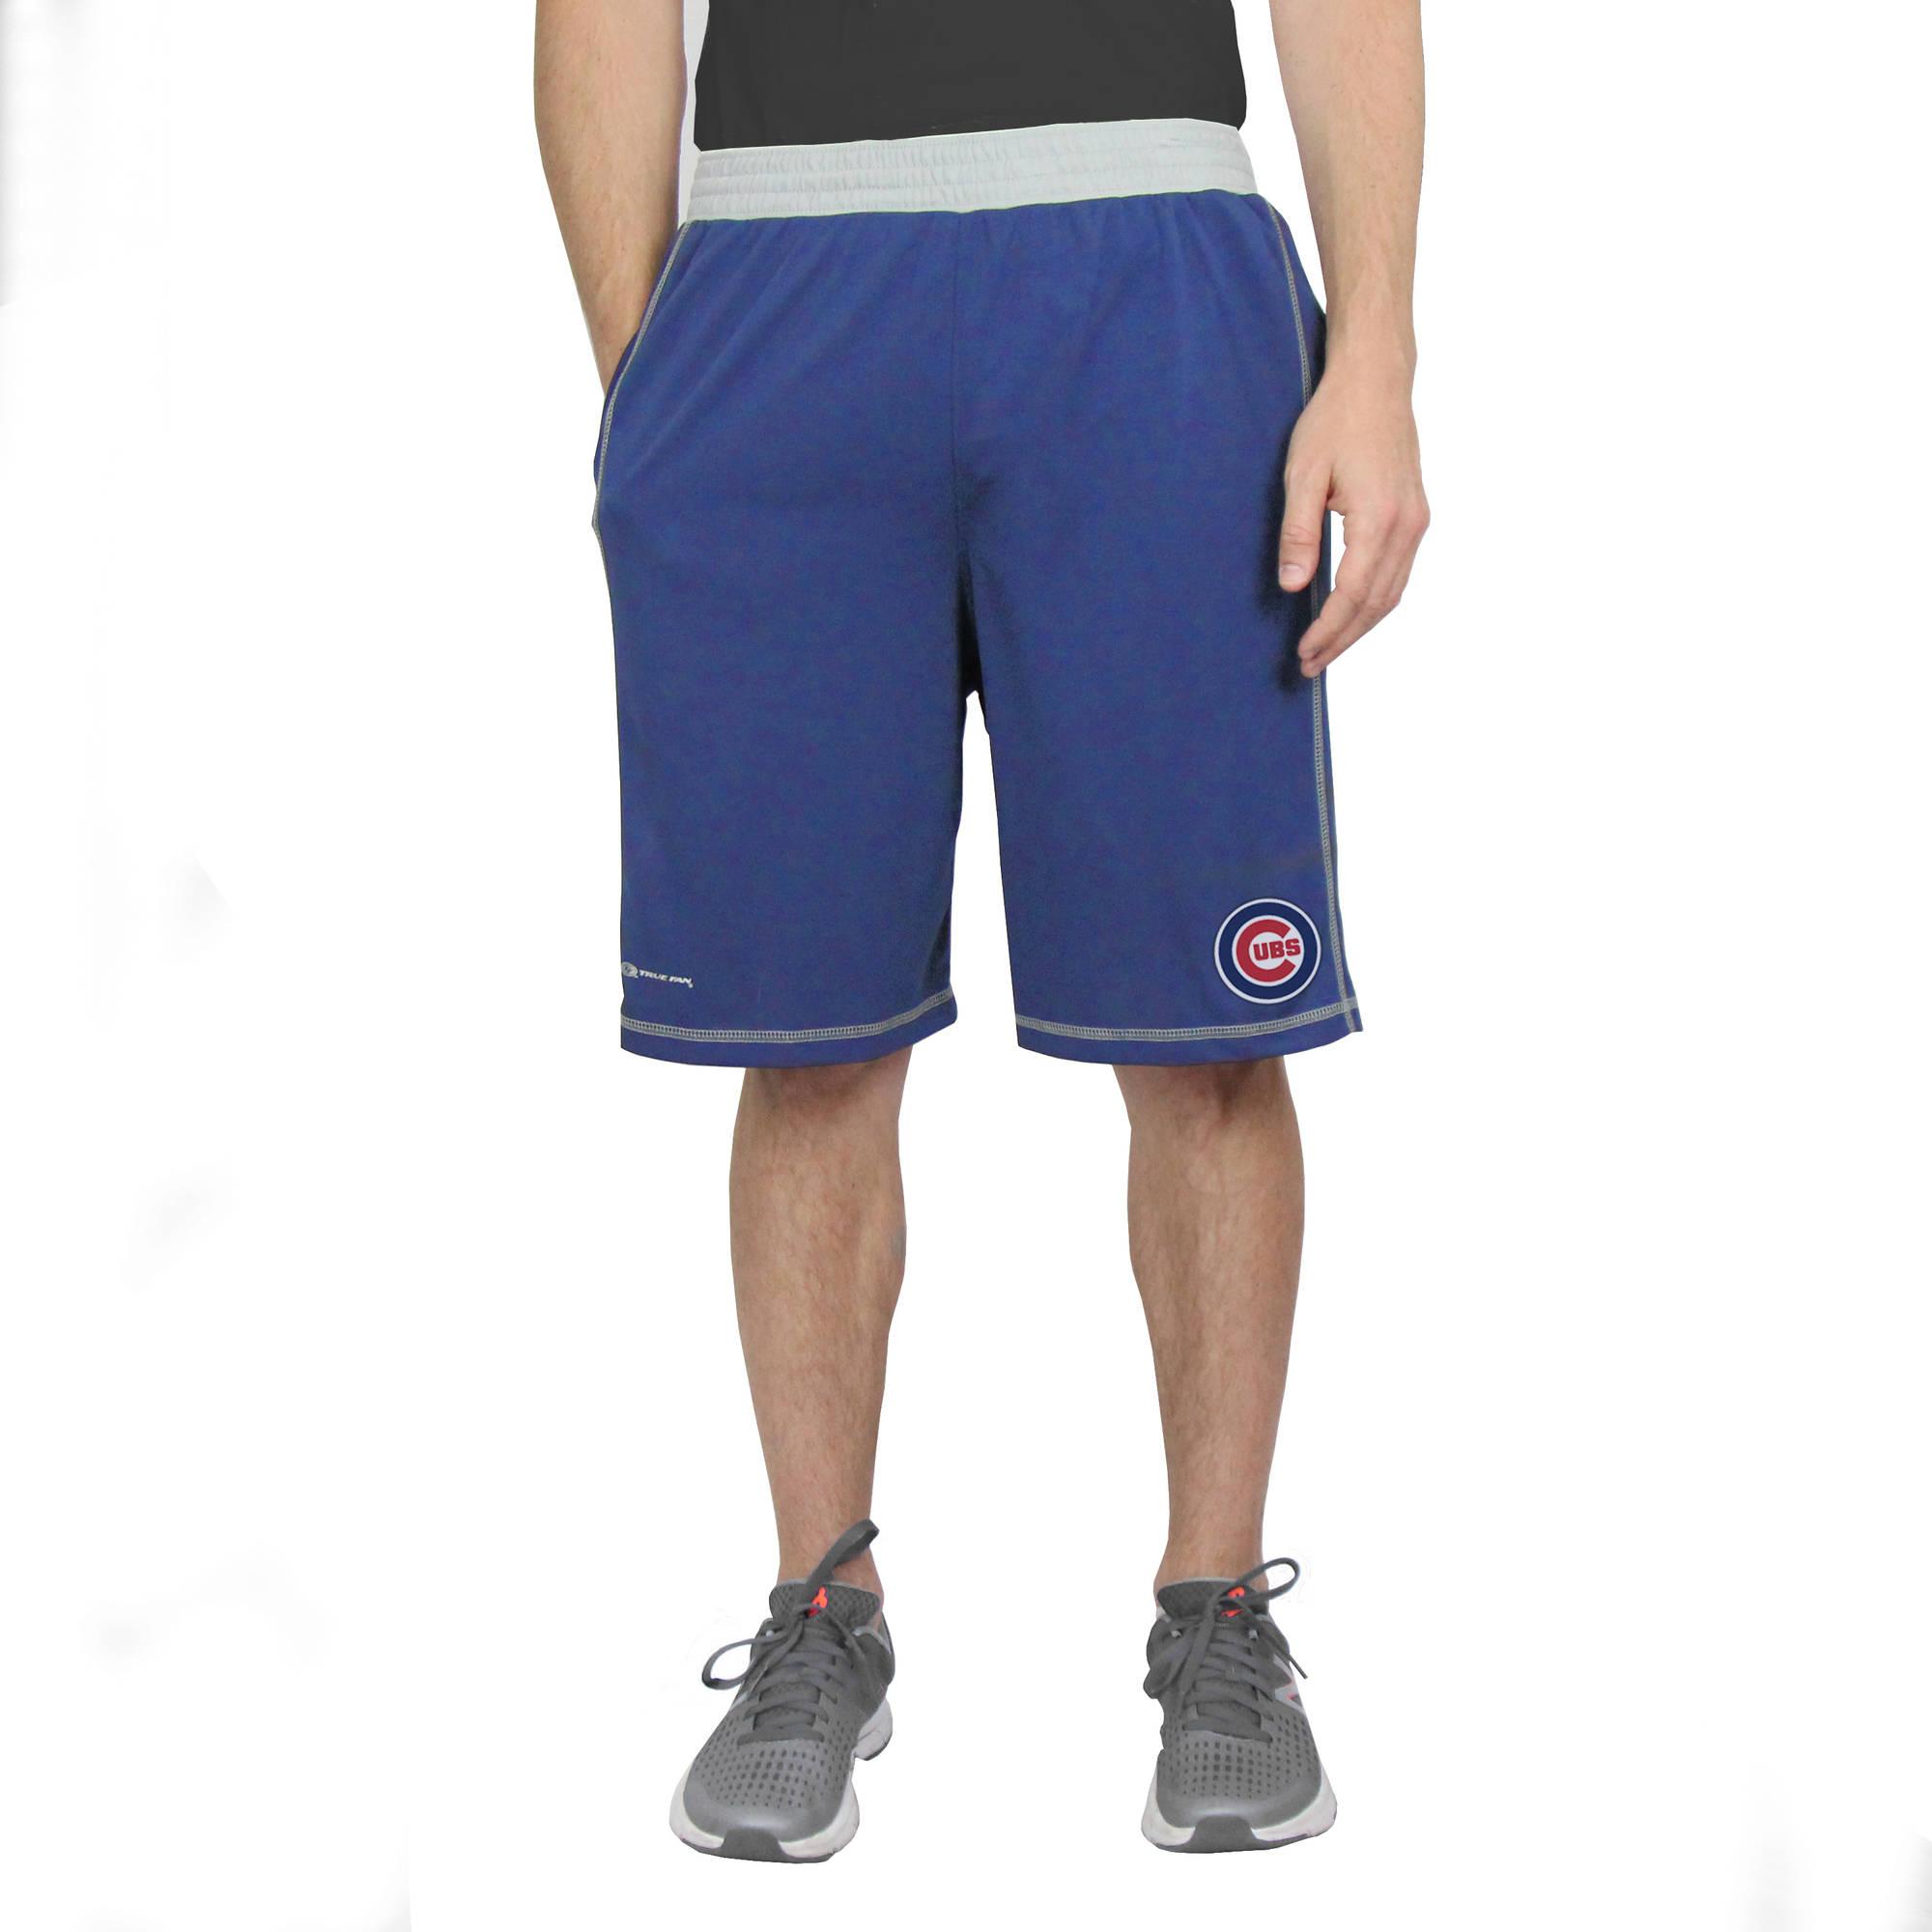 MLB Chicago Cubs Men's short poly pinhole mesh Jersey, 2XL